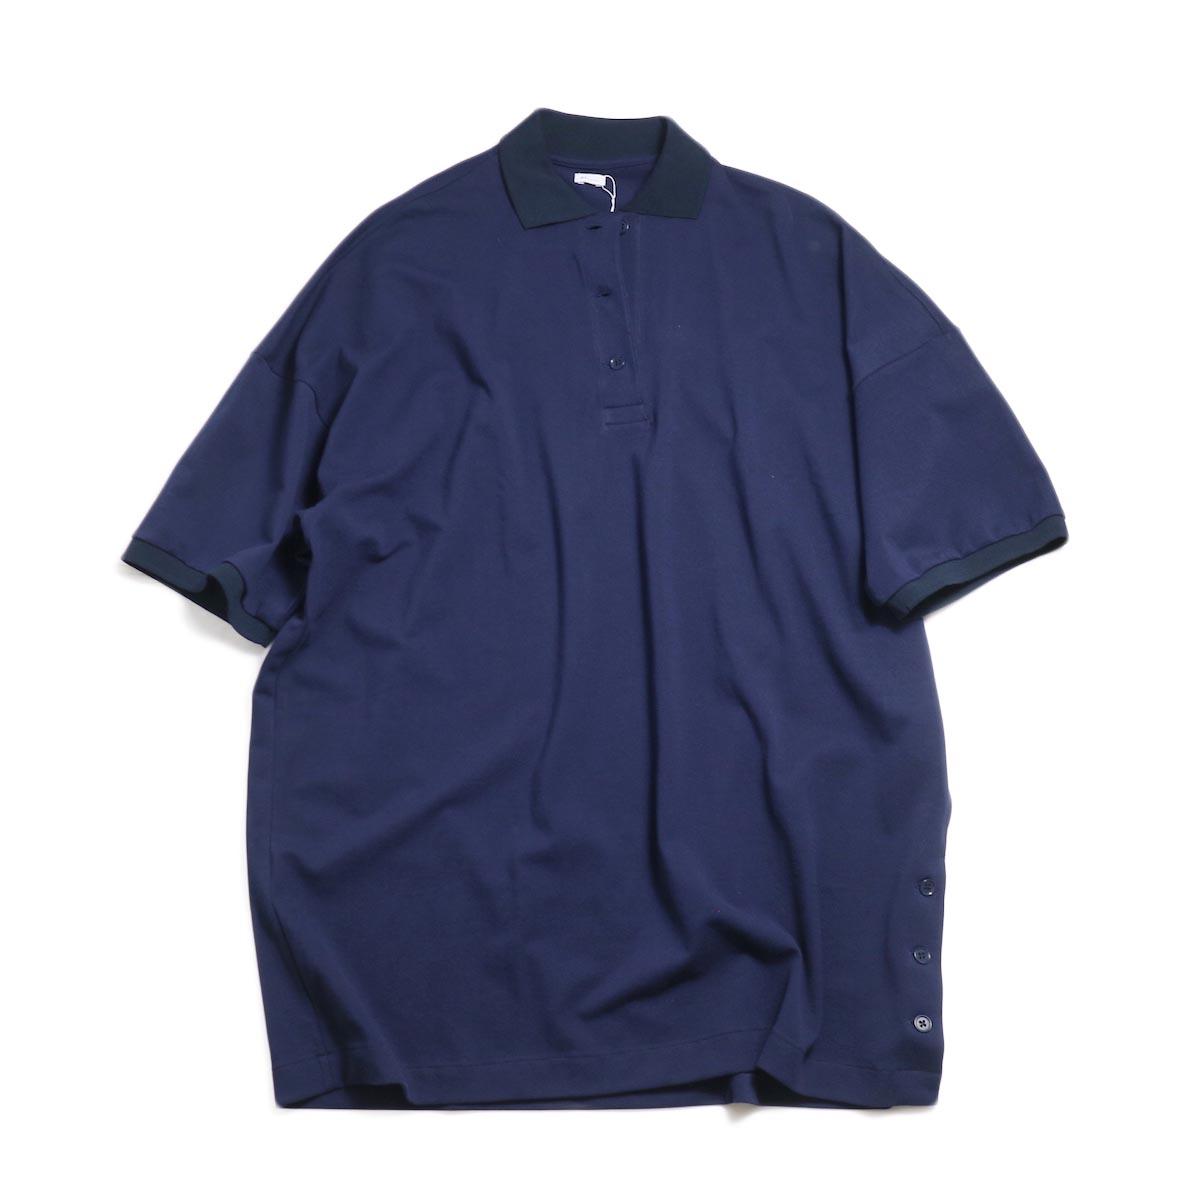 MY_ / Polo Shirt One Piece -Navy